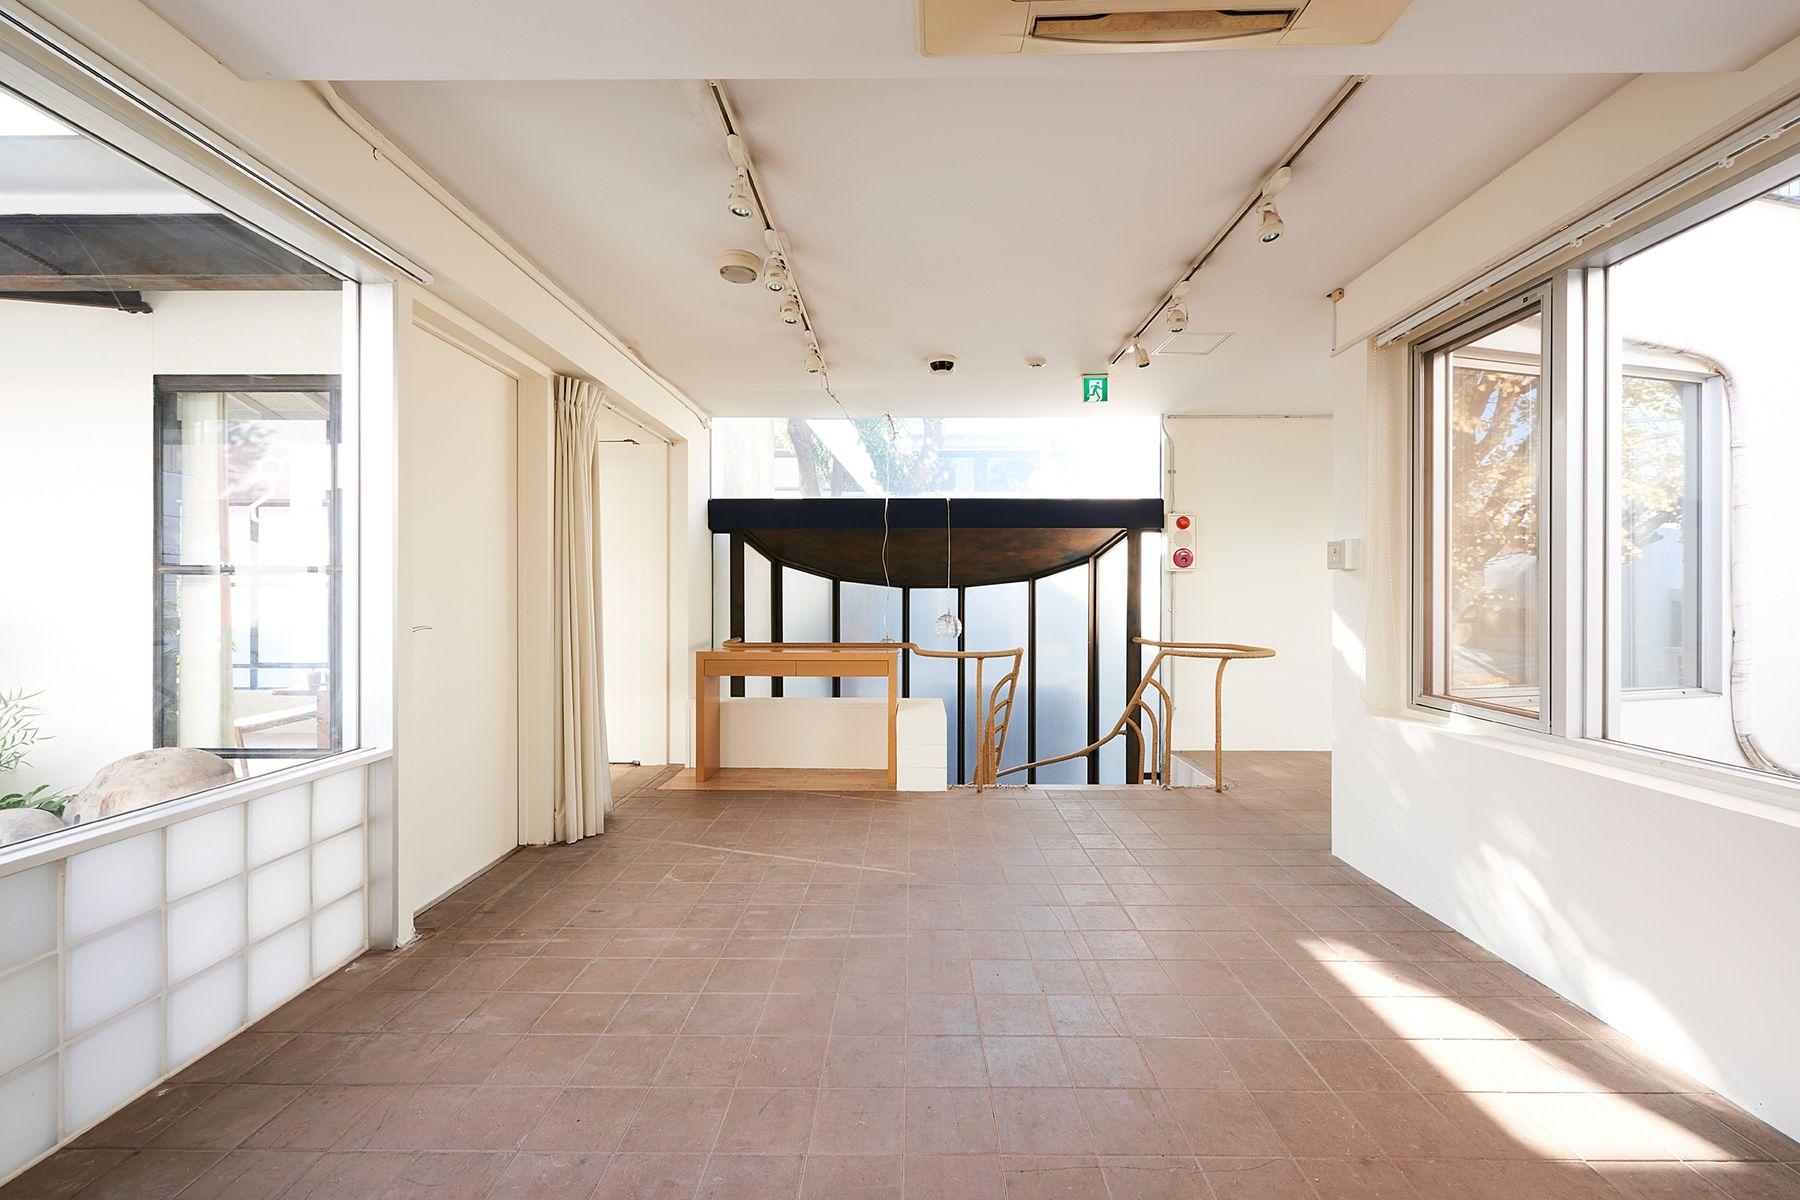 additional gallery (アディショナルギャラリー)通路